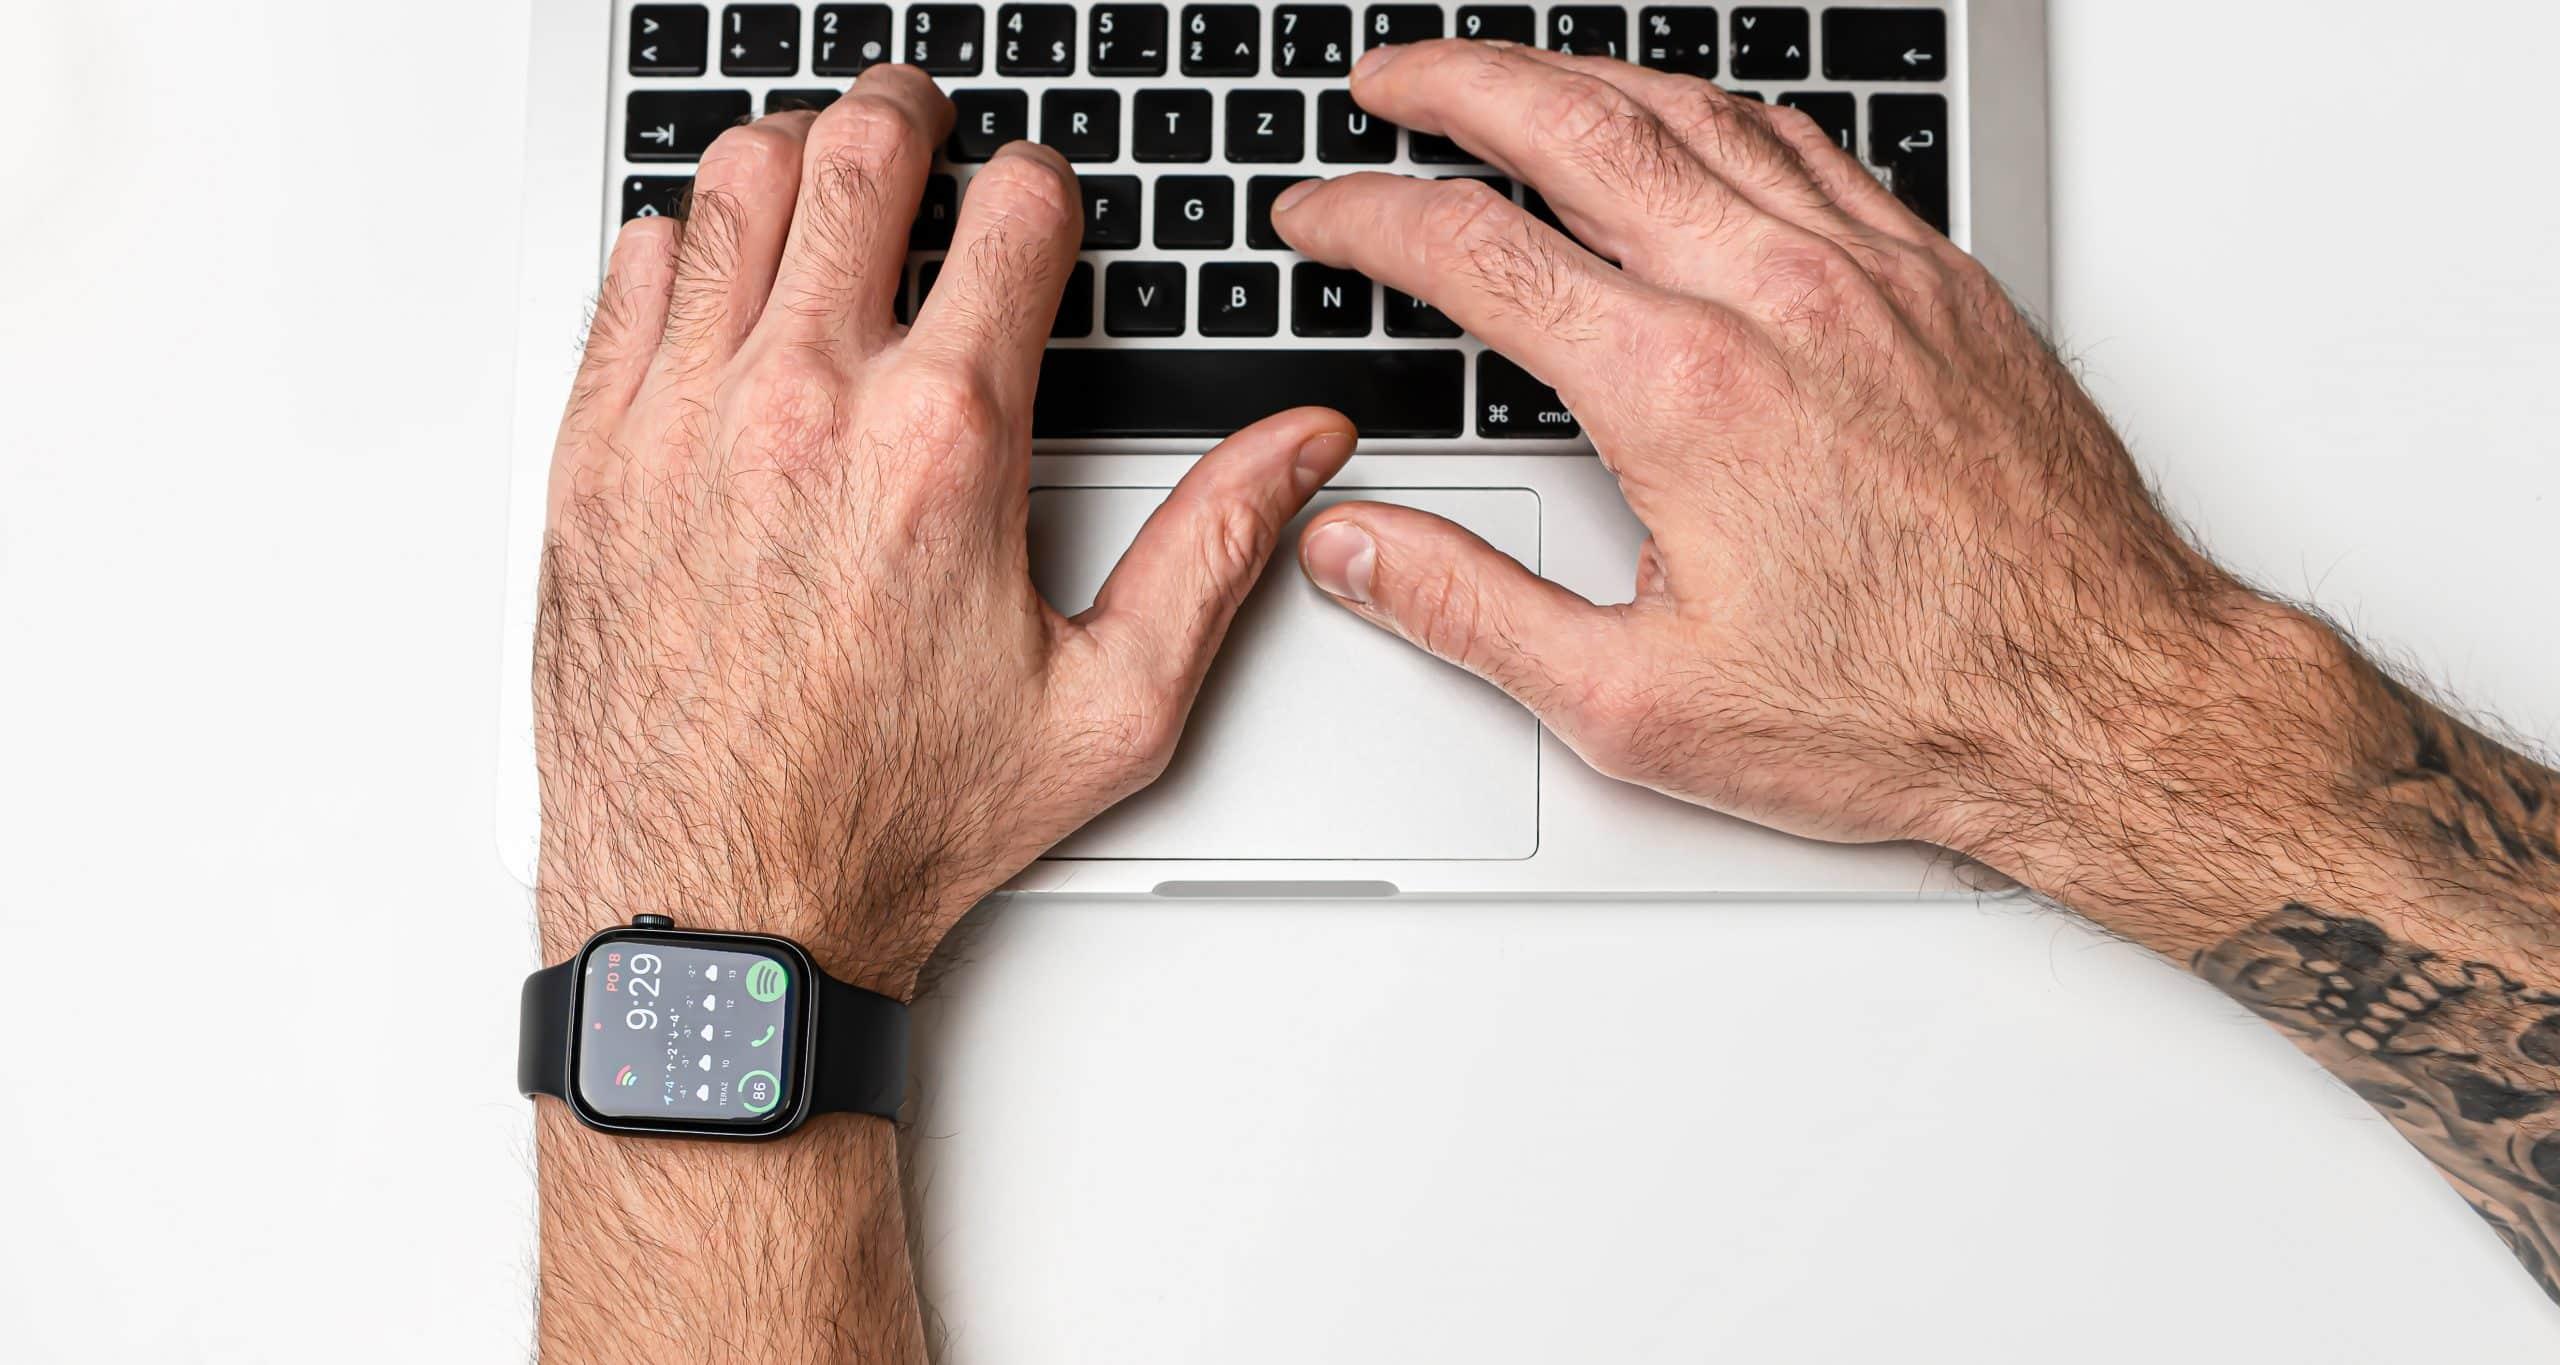 Apple Watch SE prekvapia cenovkou aj funkciami